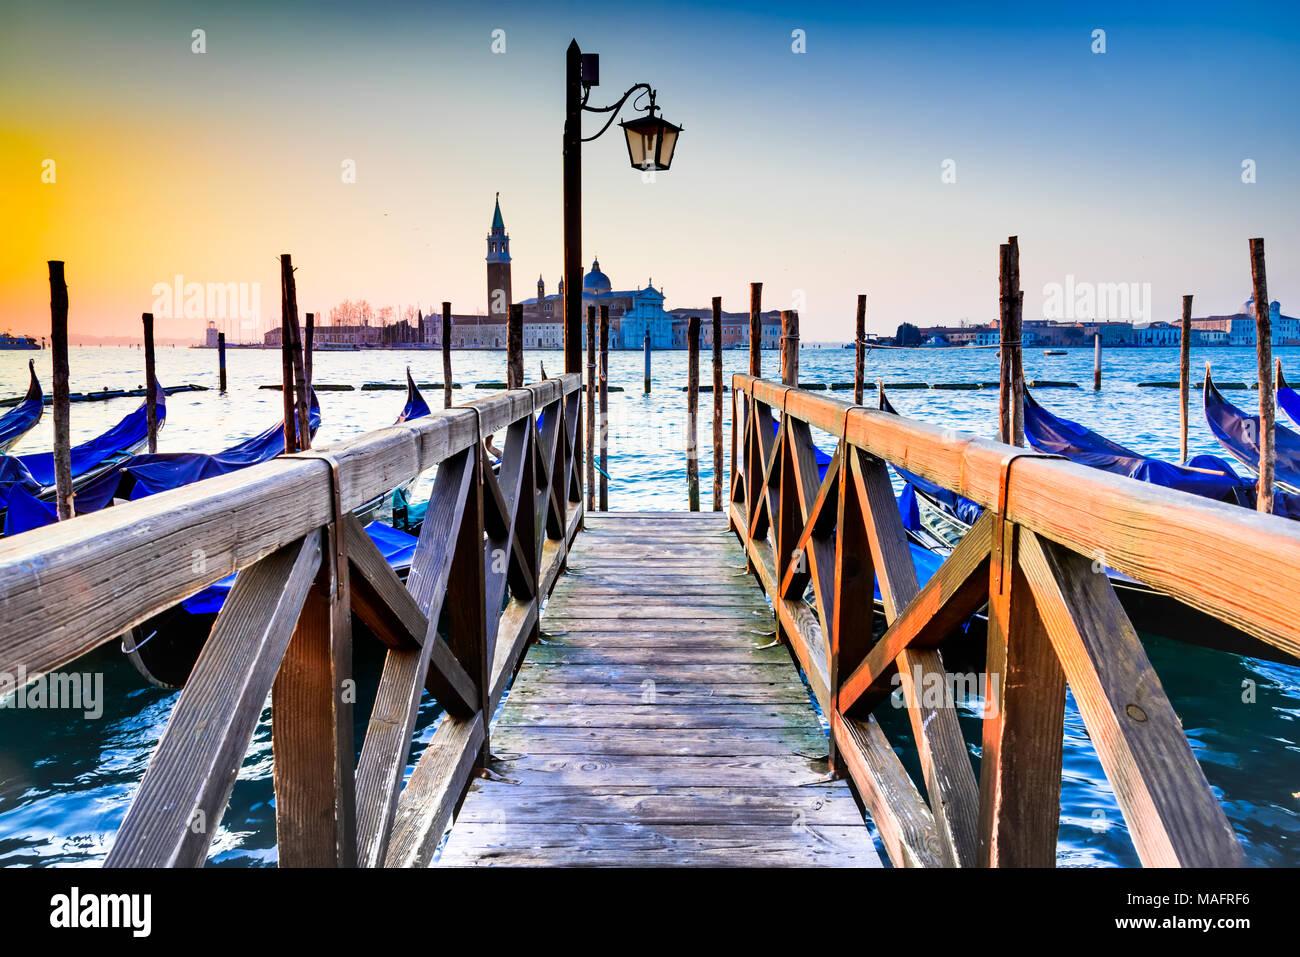 Venedig, Italien. Sunrise mit Gondeln am Canale Grande, Piazza San Marco, Adria. Stockbild